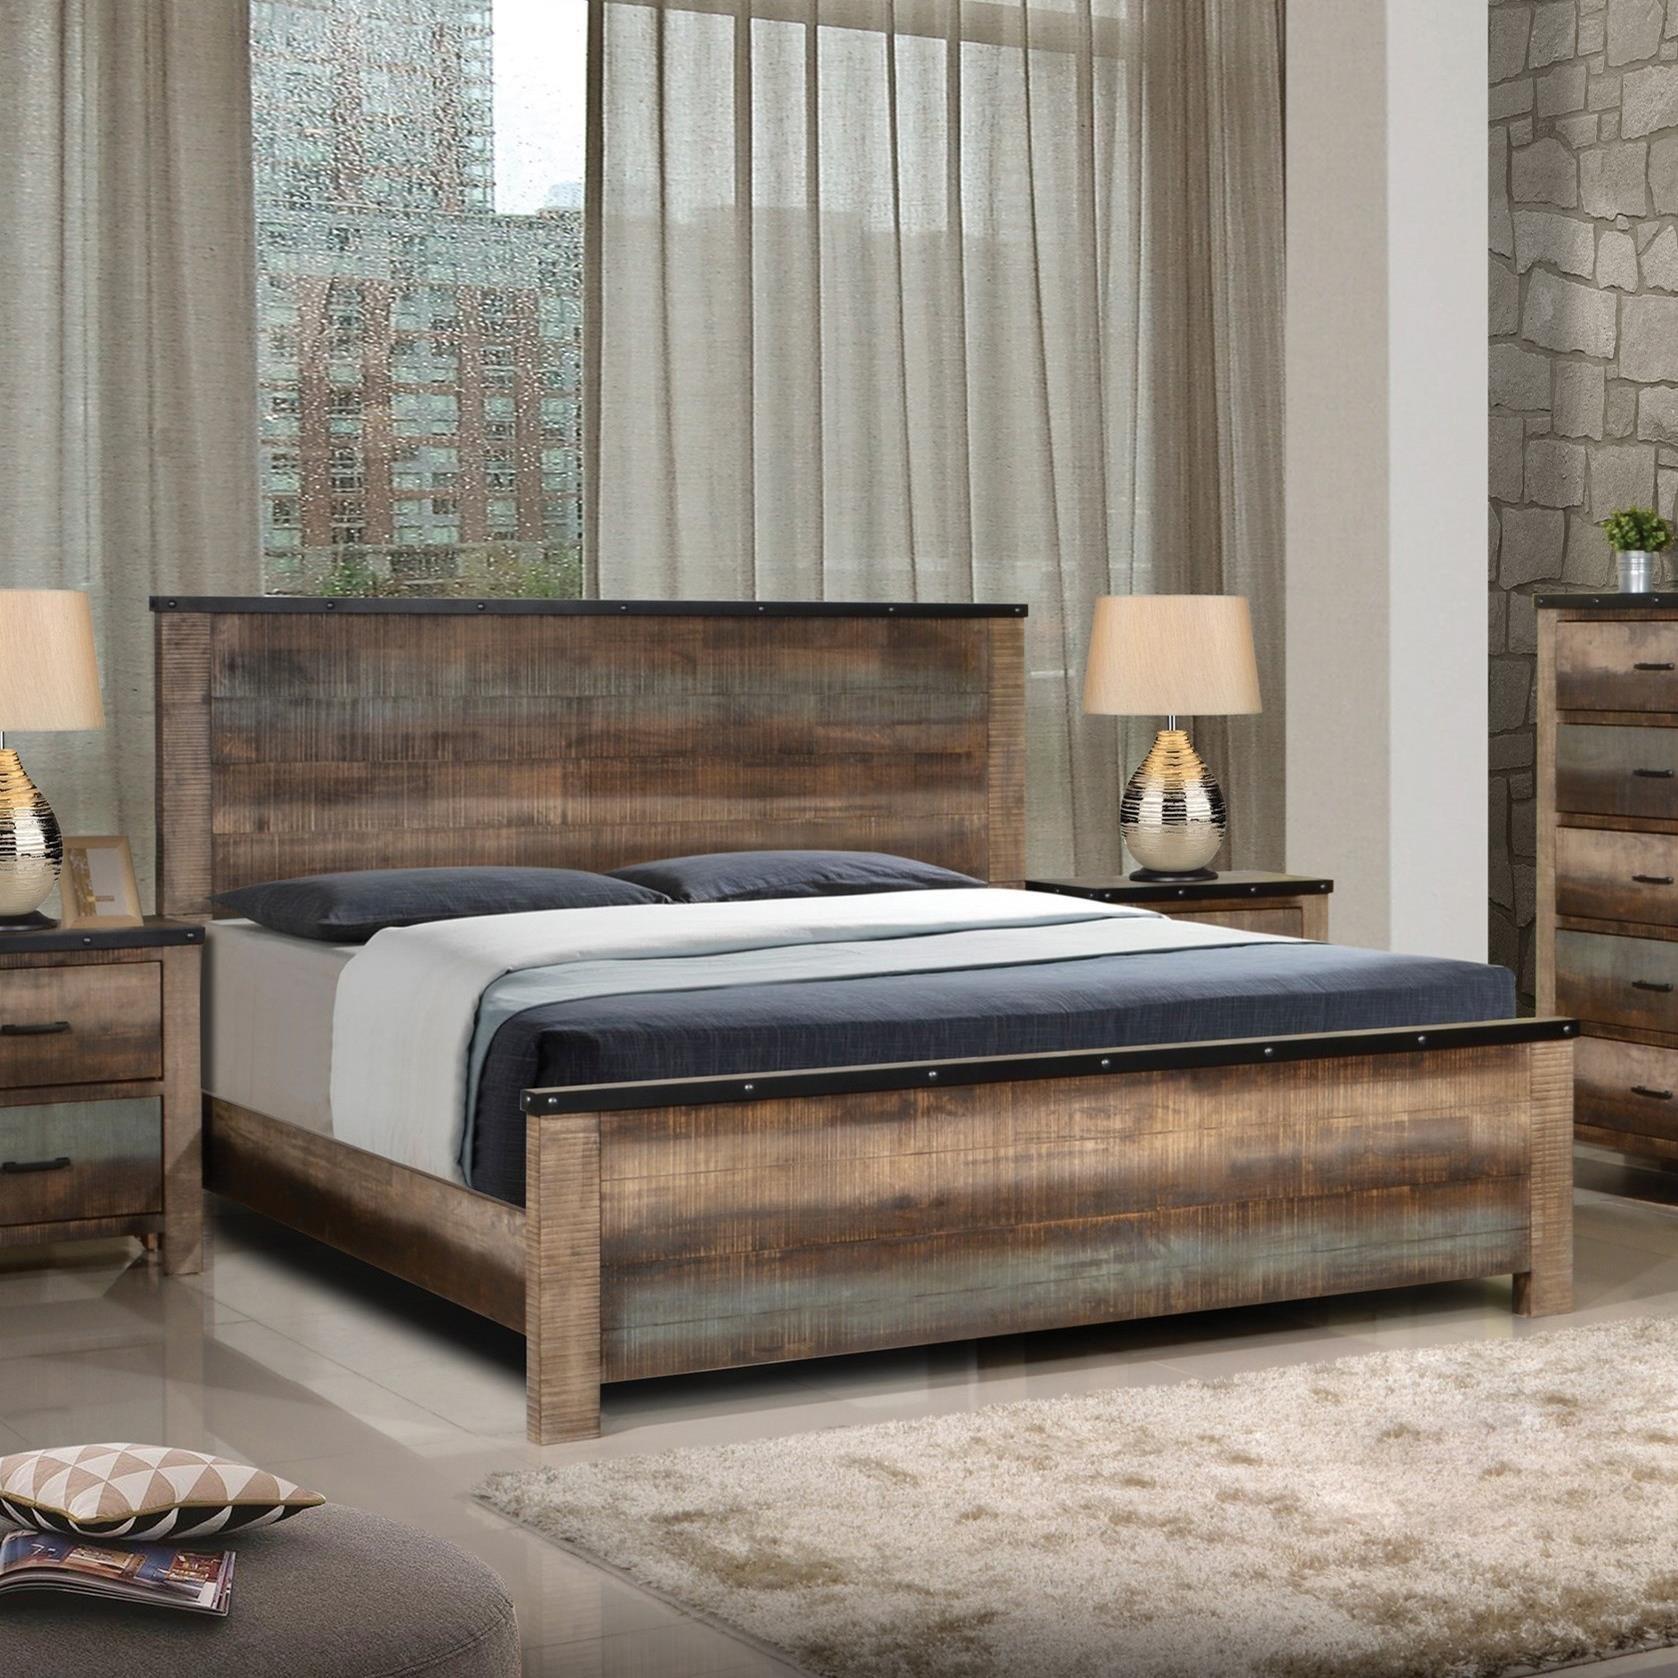 sembene california king bed